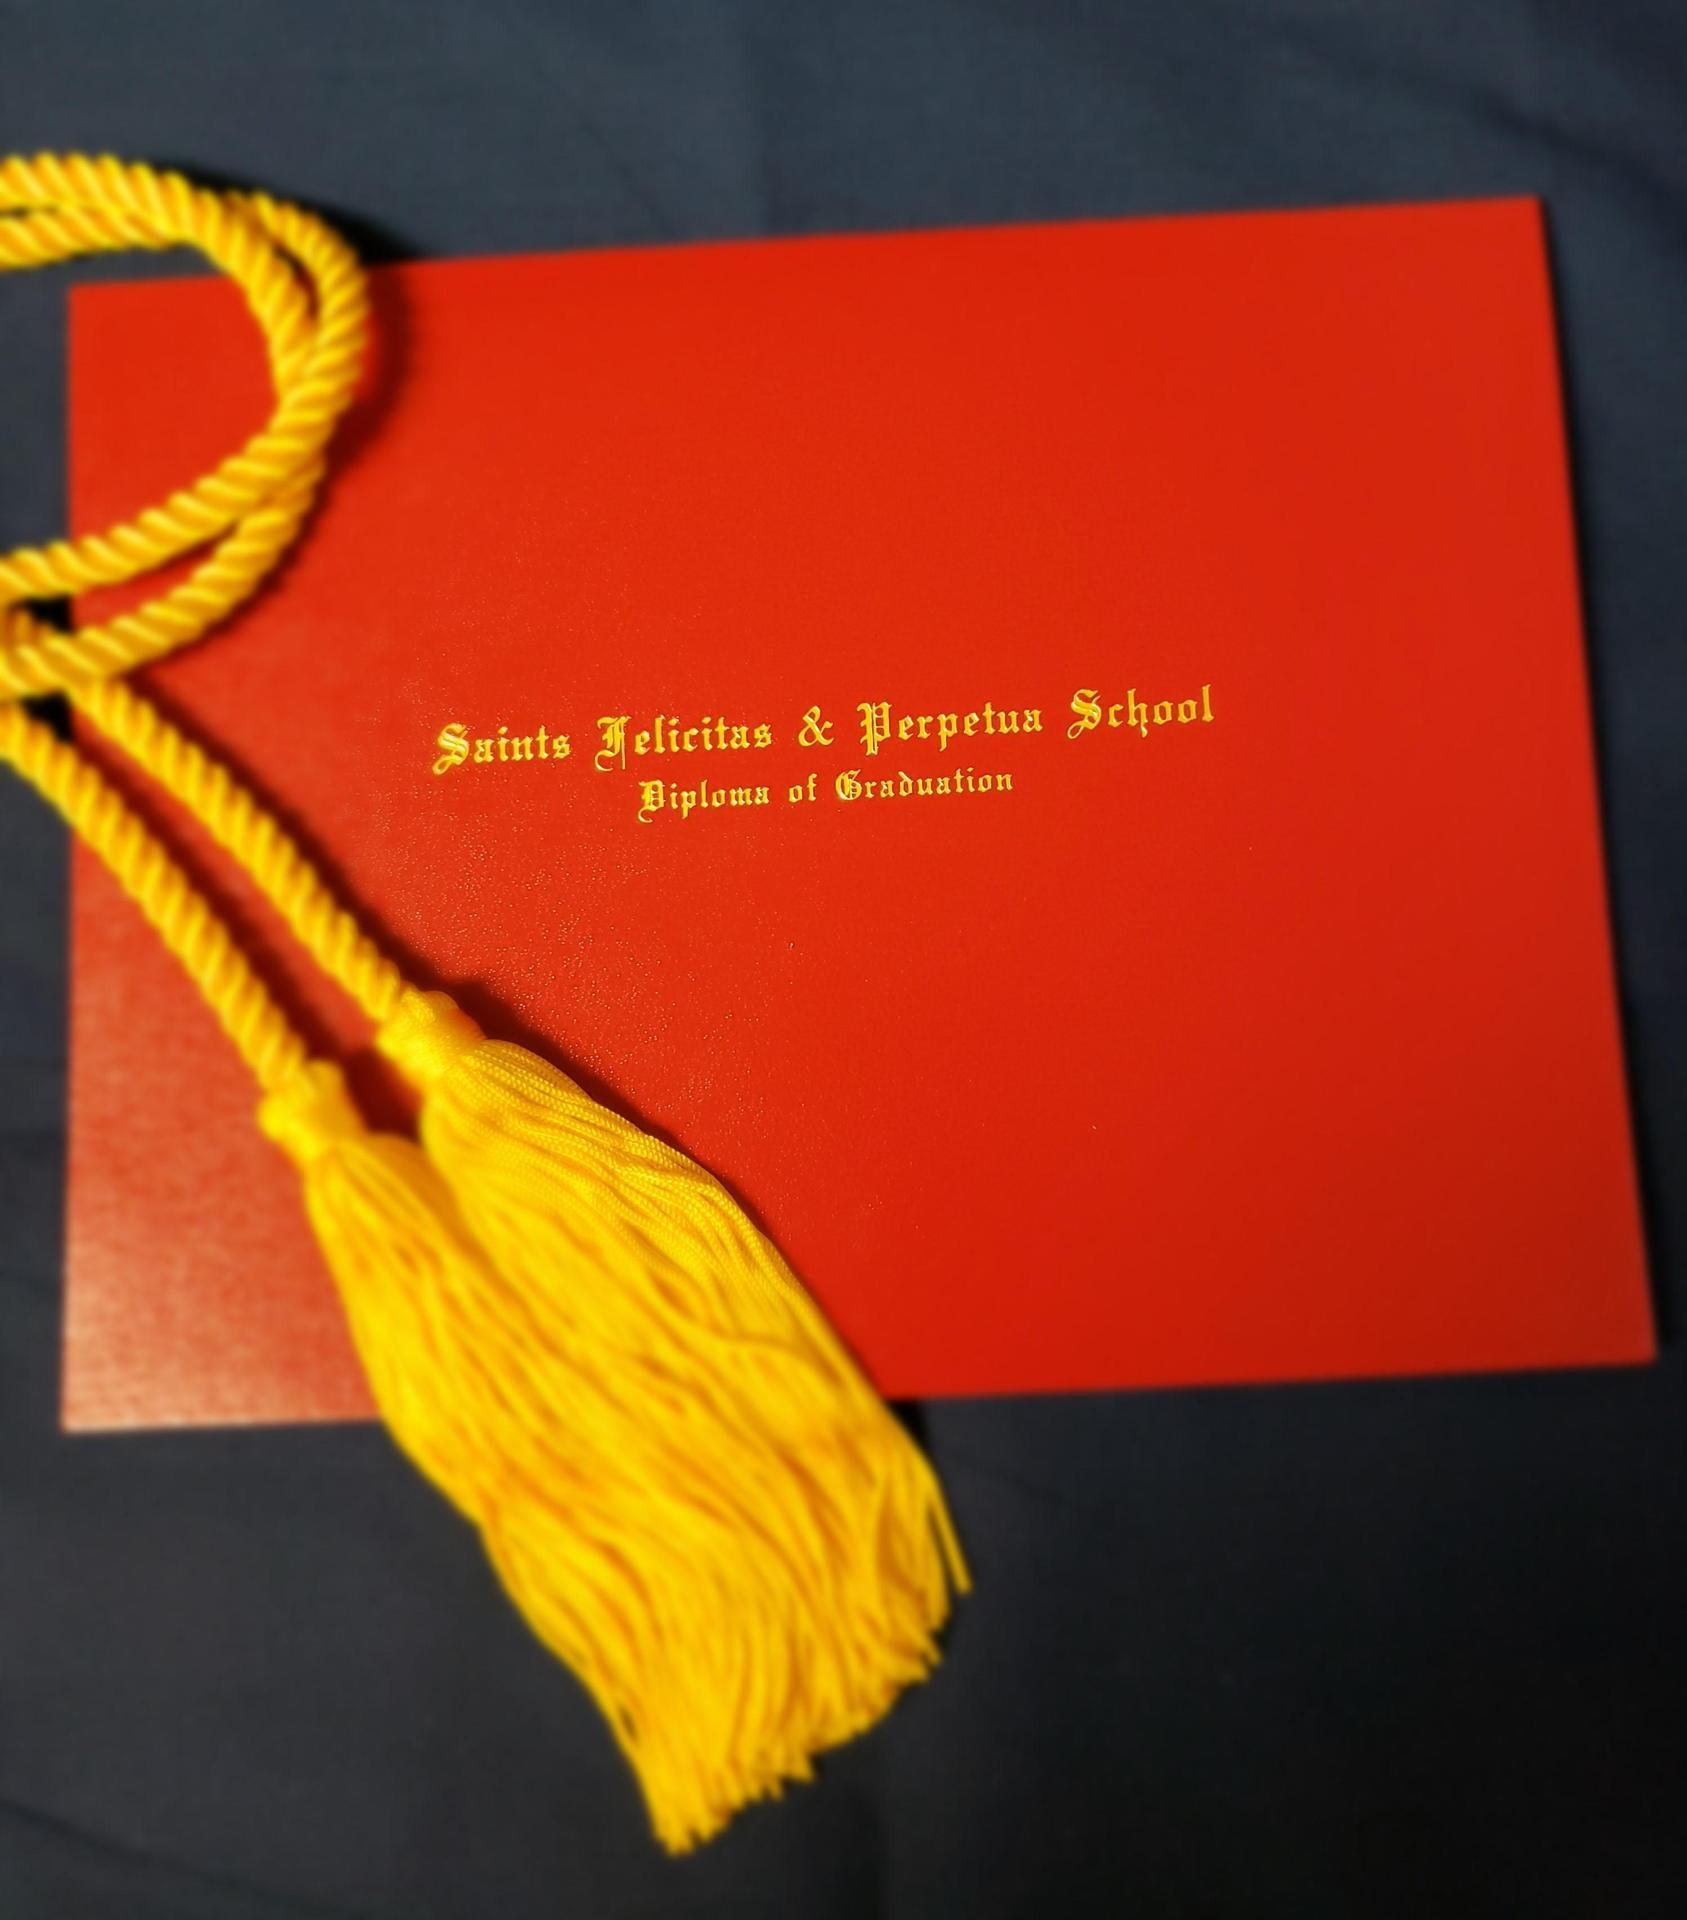 diploma cropped